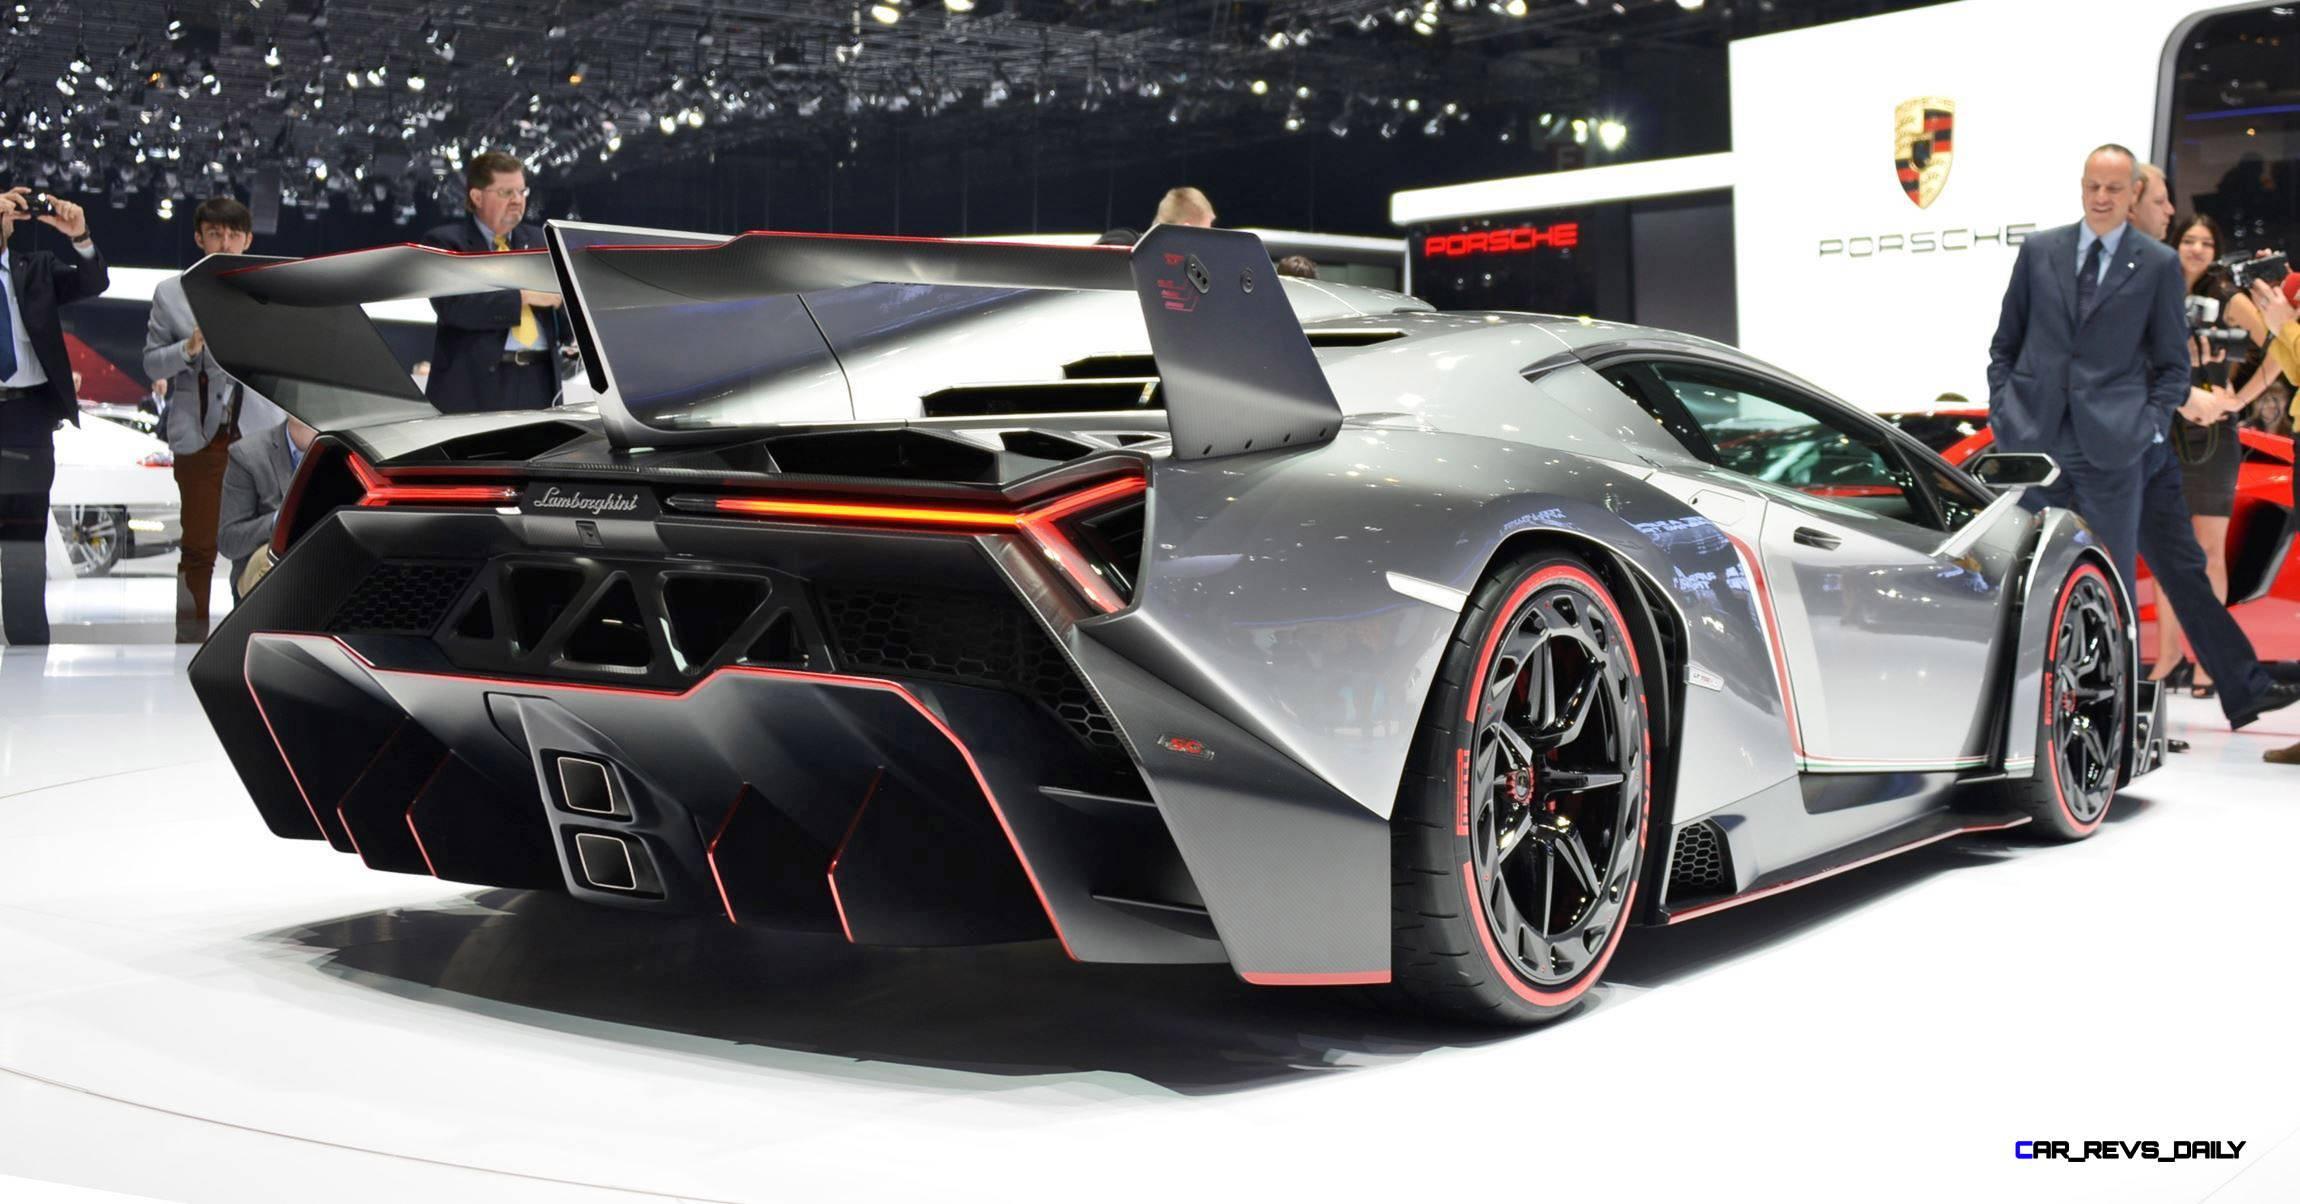 Lamborghini Veneno Coupe >> 2013 Lamborghini Veneno Coupe